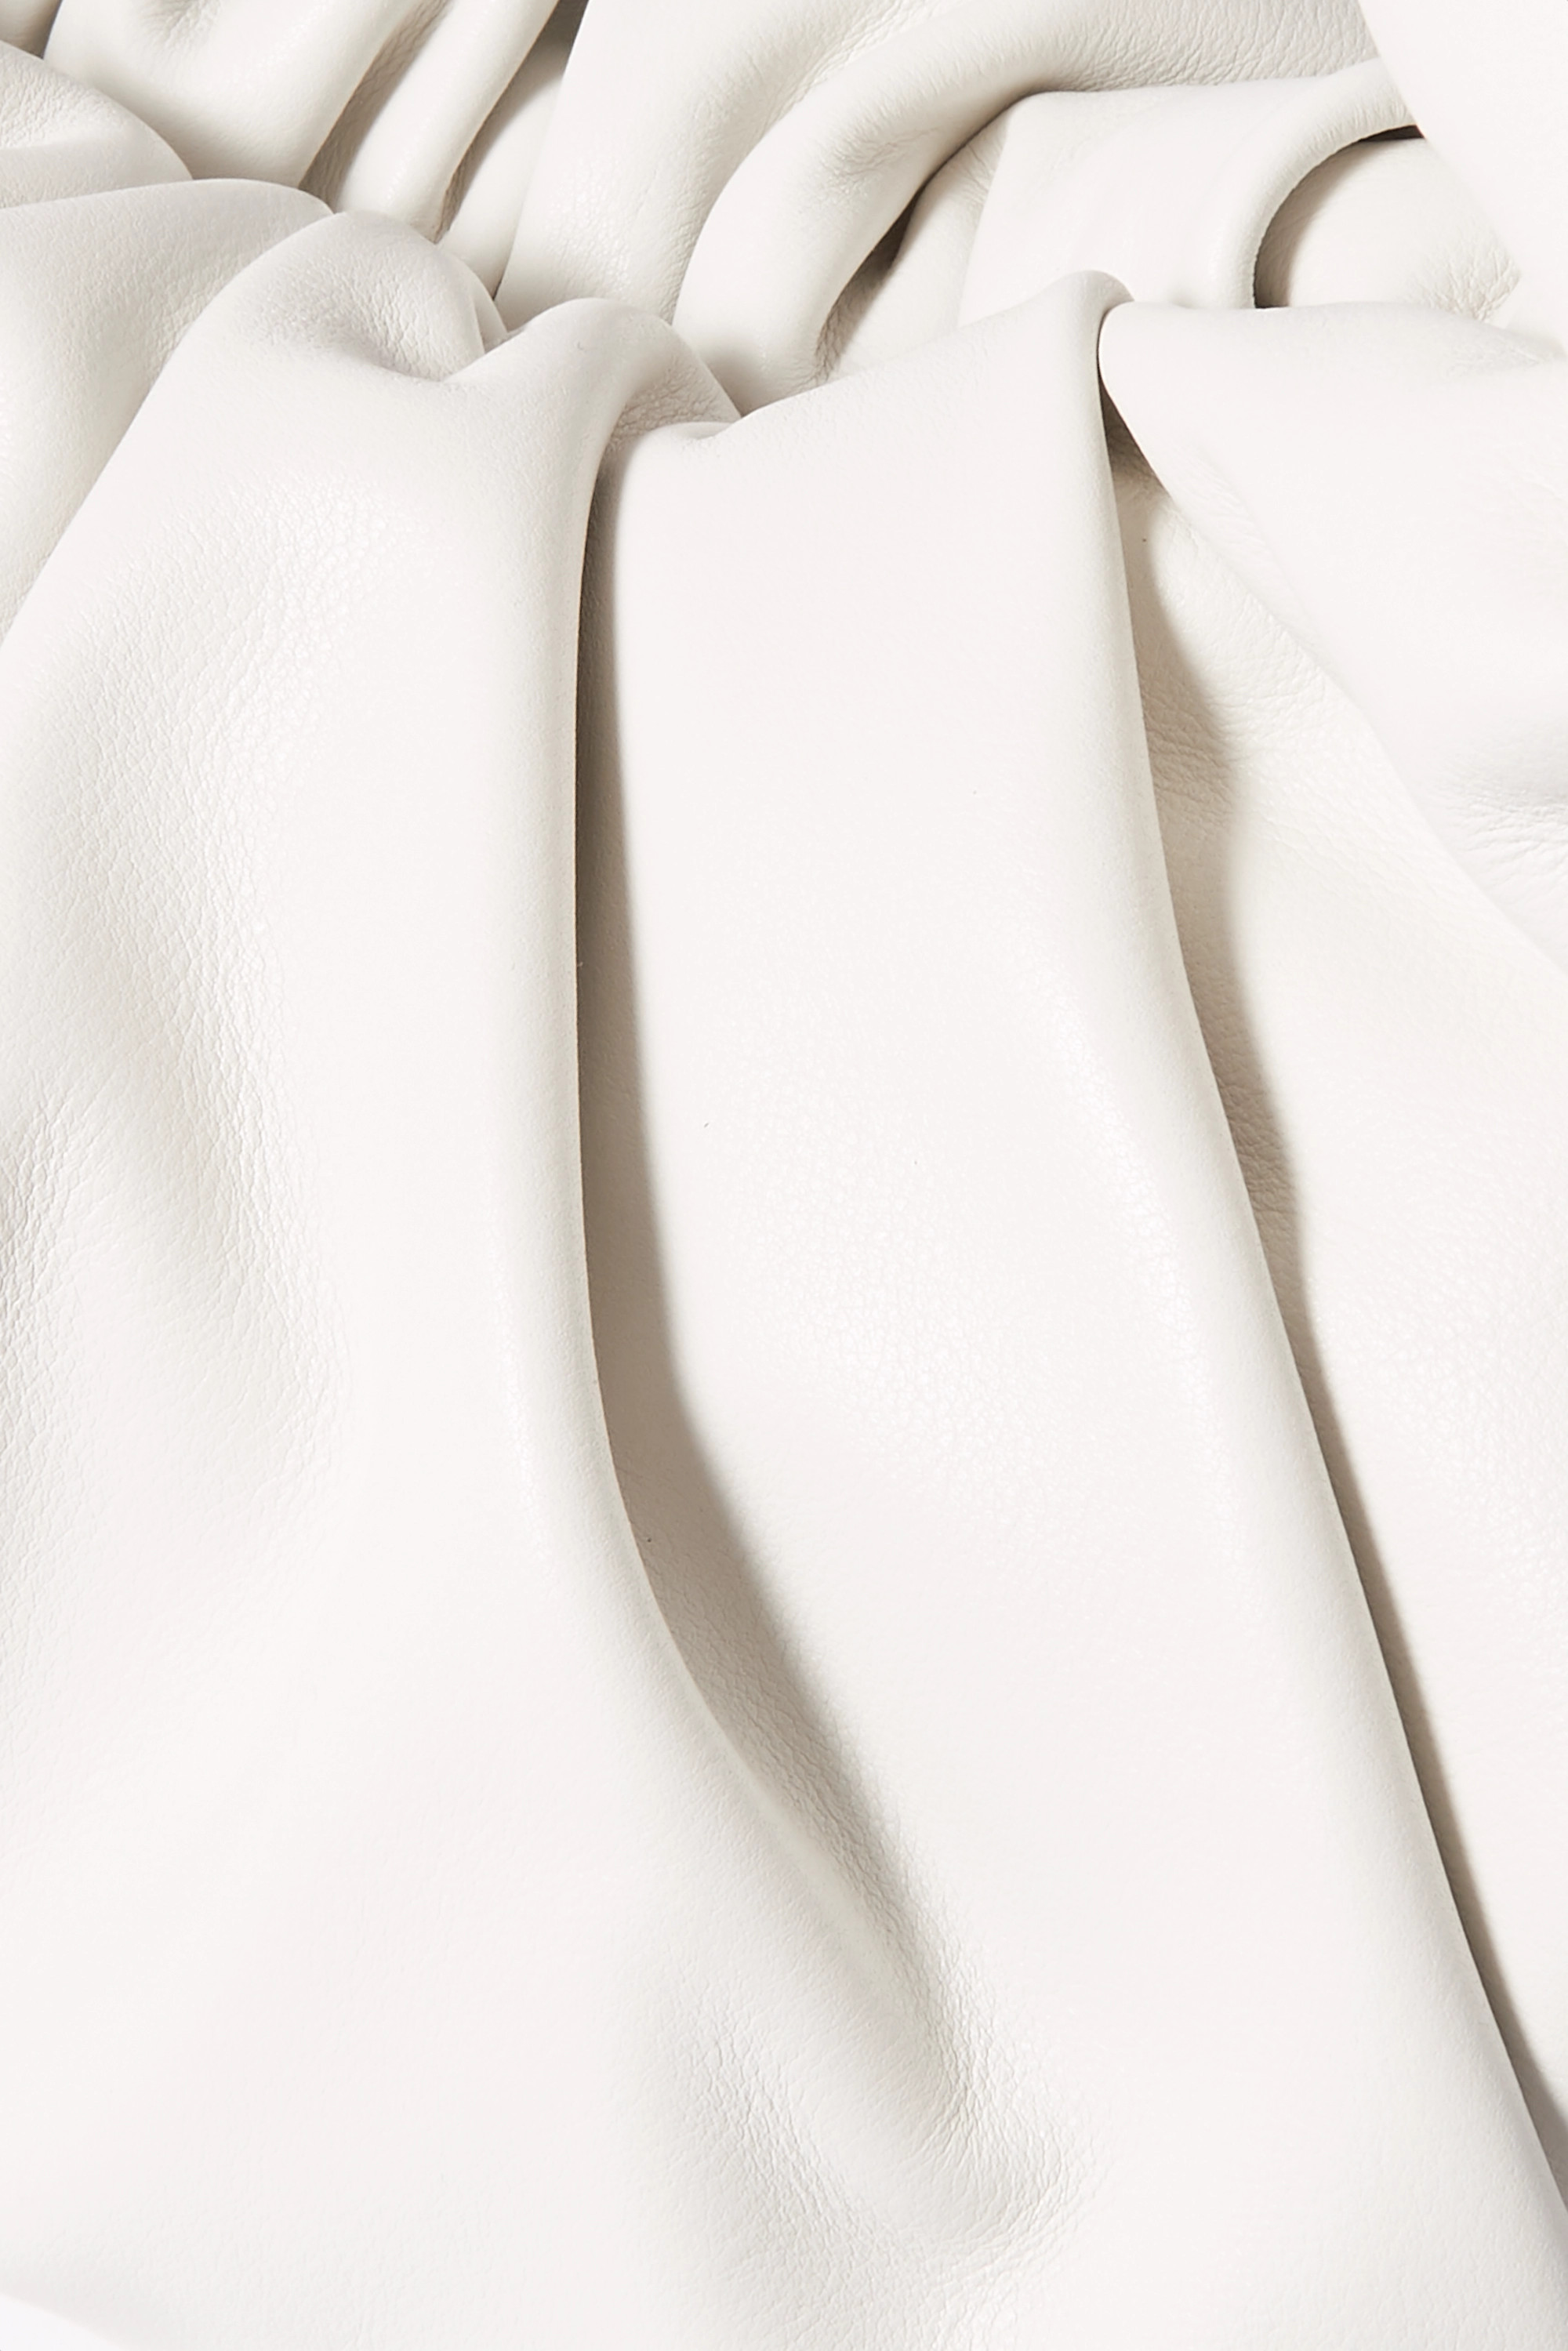 Bottega Veneta The Shoulder Pouch 缩褶皮革手提包